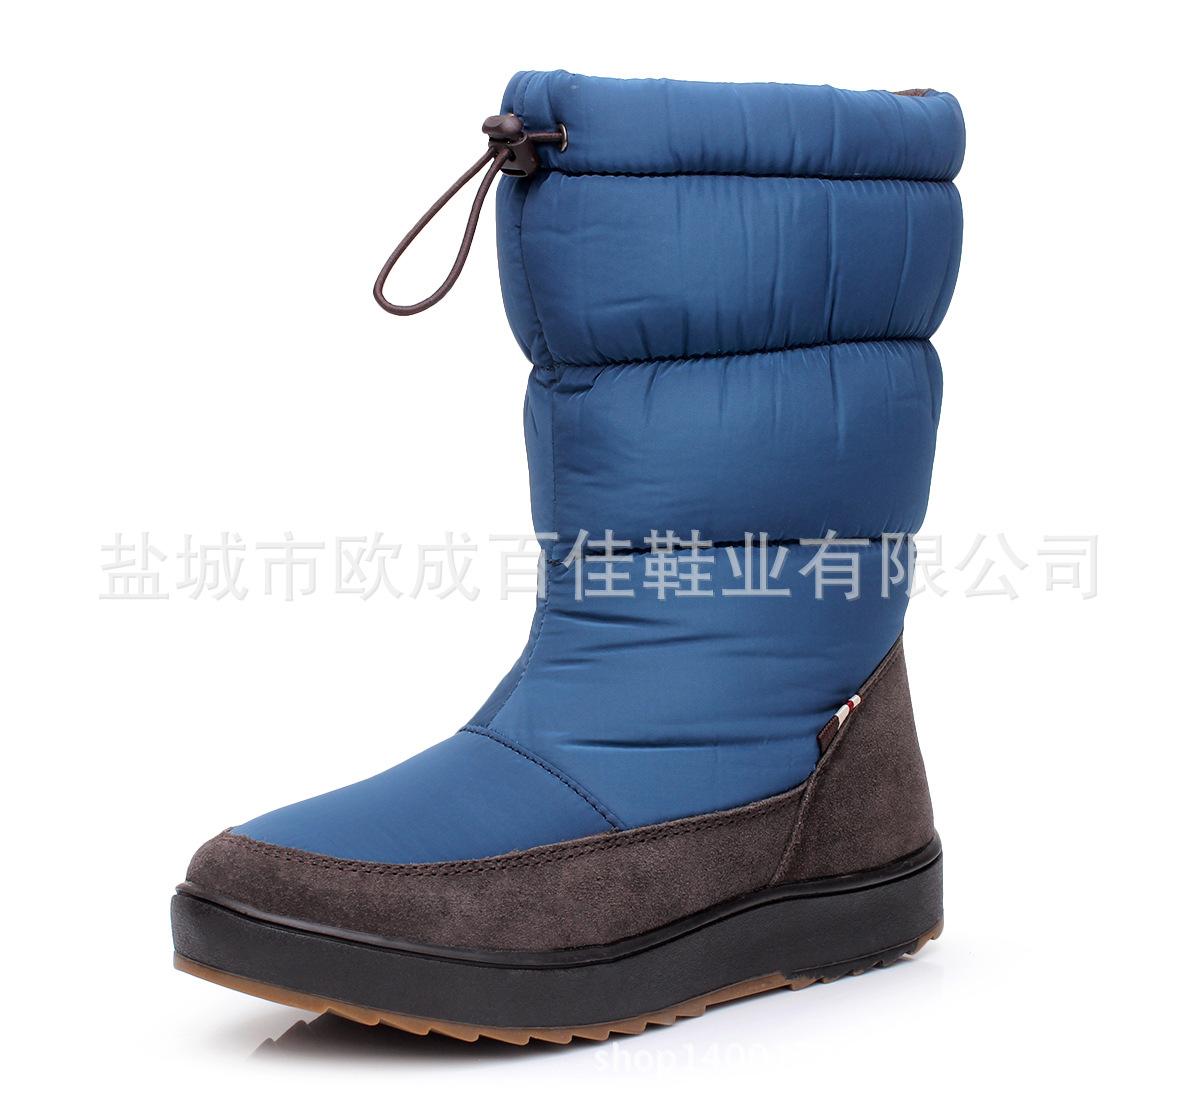 Здесь продается  Wedge Platform Flat Warm Women Fashion Snow Boots 2015 Ski Waterproof Ladies Shoes Cotton-padded Winter Casual Shoes   Обувь